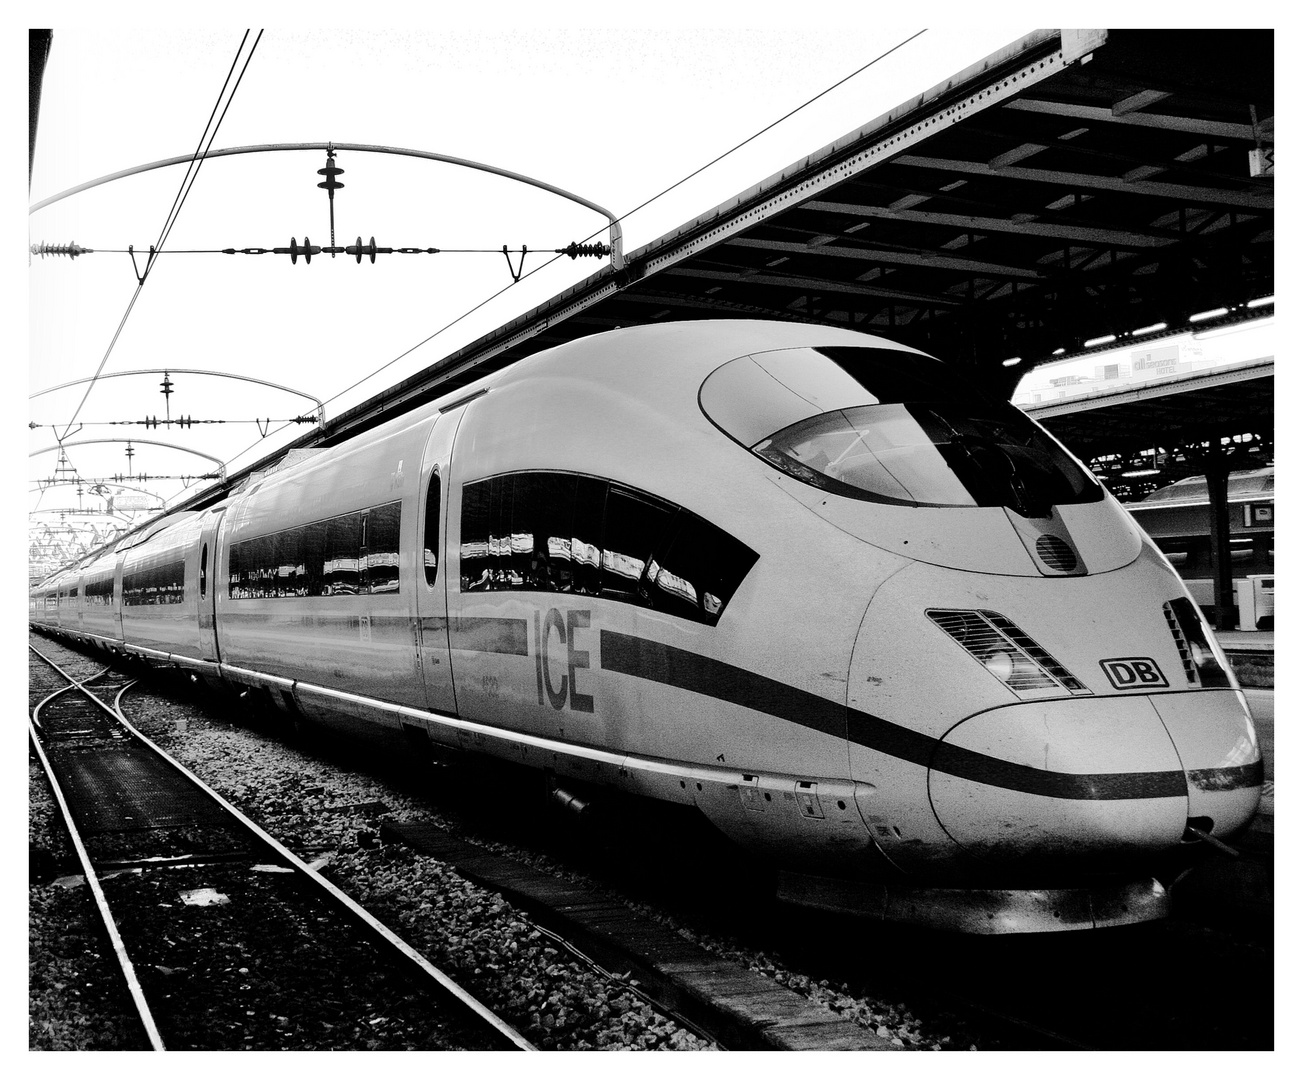 le tgv allemand de la db (gare de l'est)